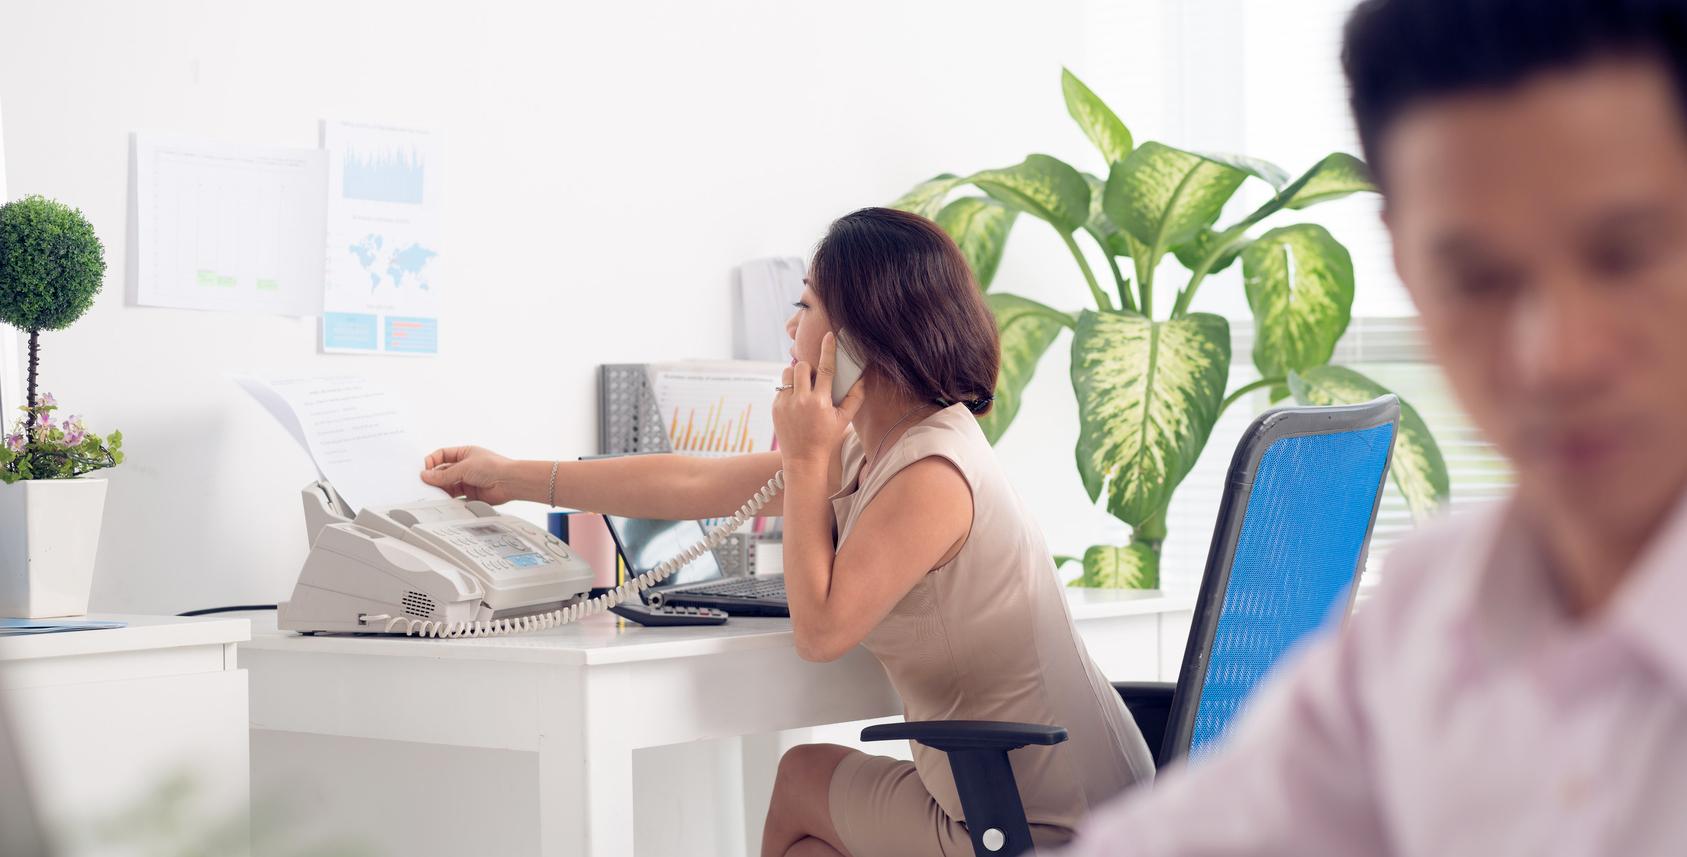 Envoi de Fax mailing